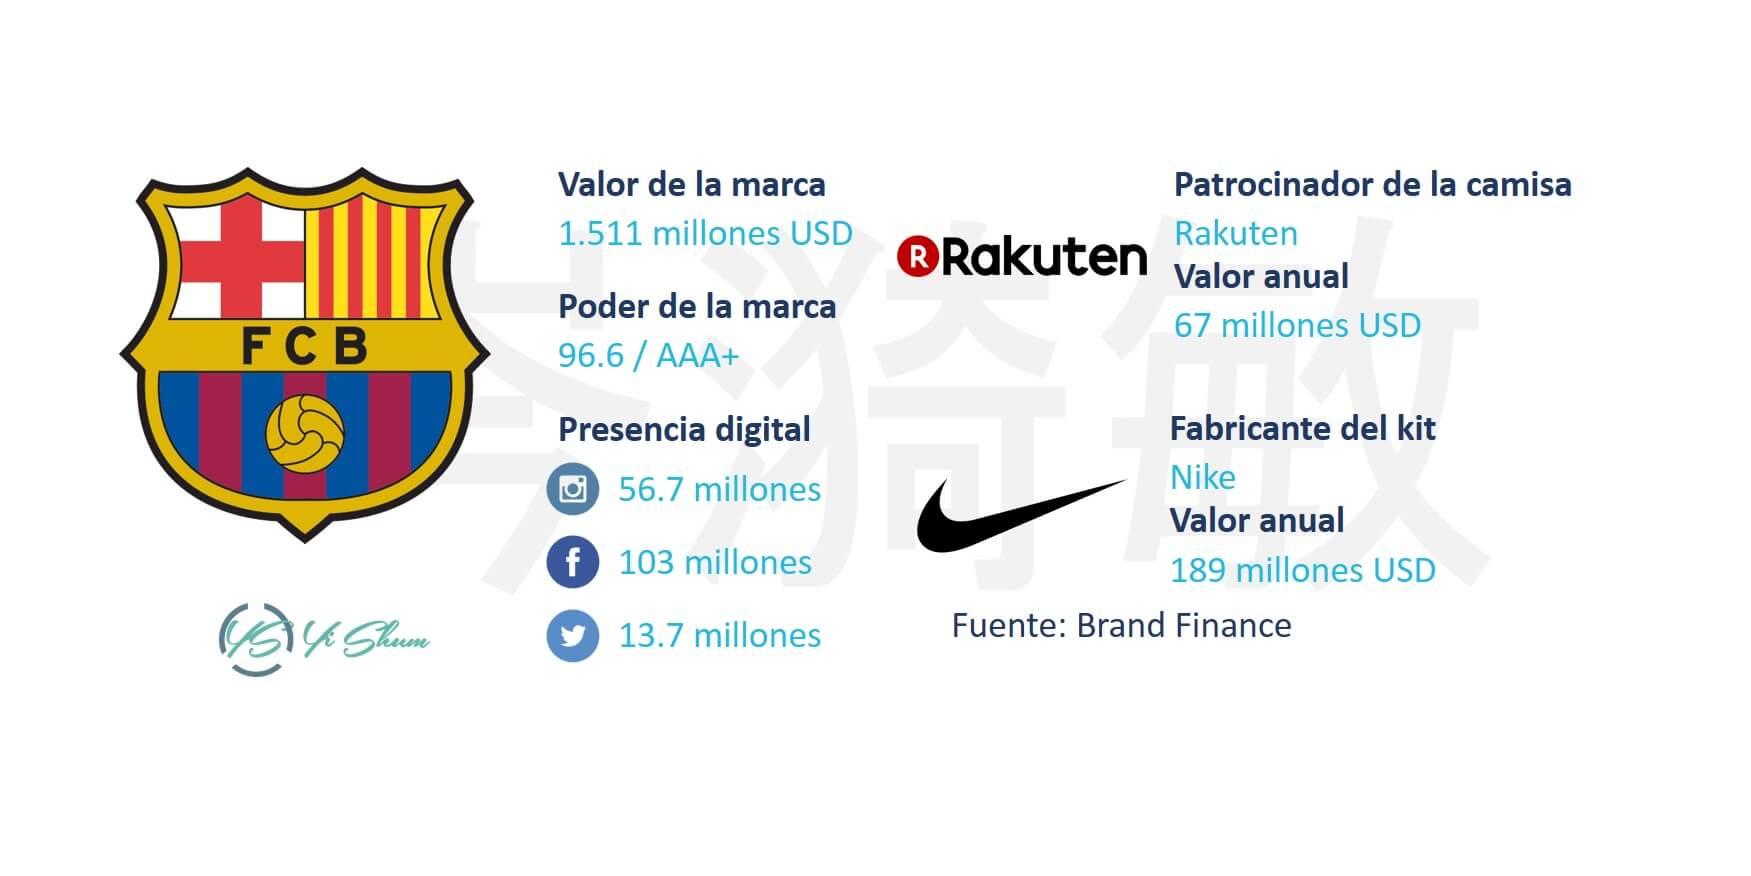 FC Barcelona - Ficha técnico imagen